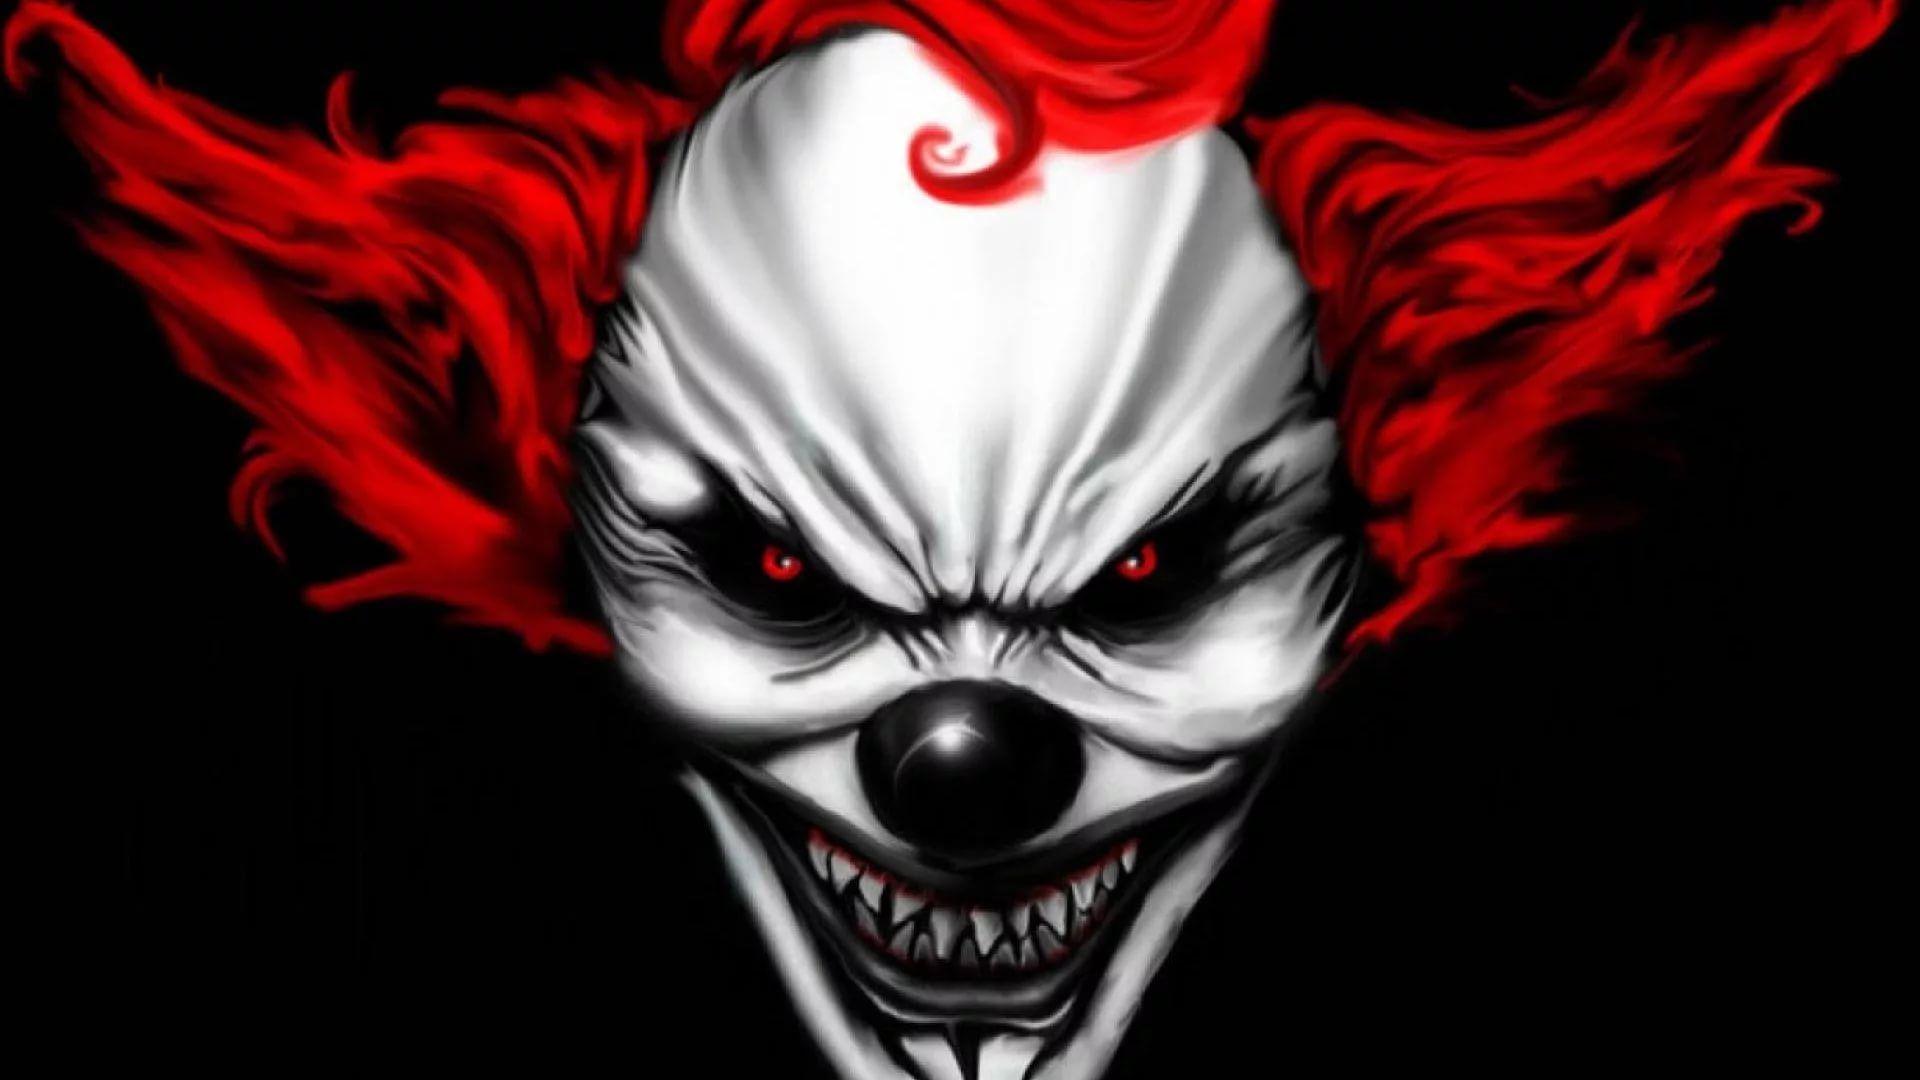 Killer Clown HD Wallpaper